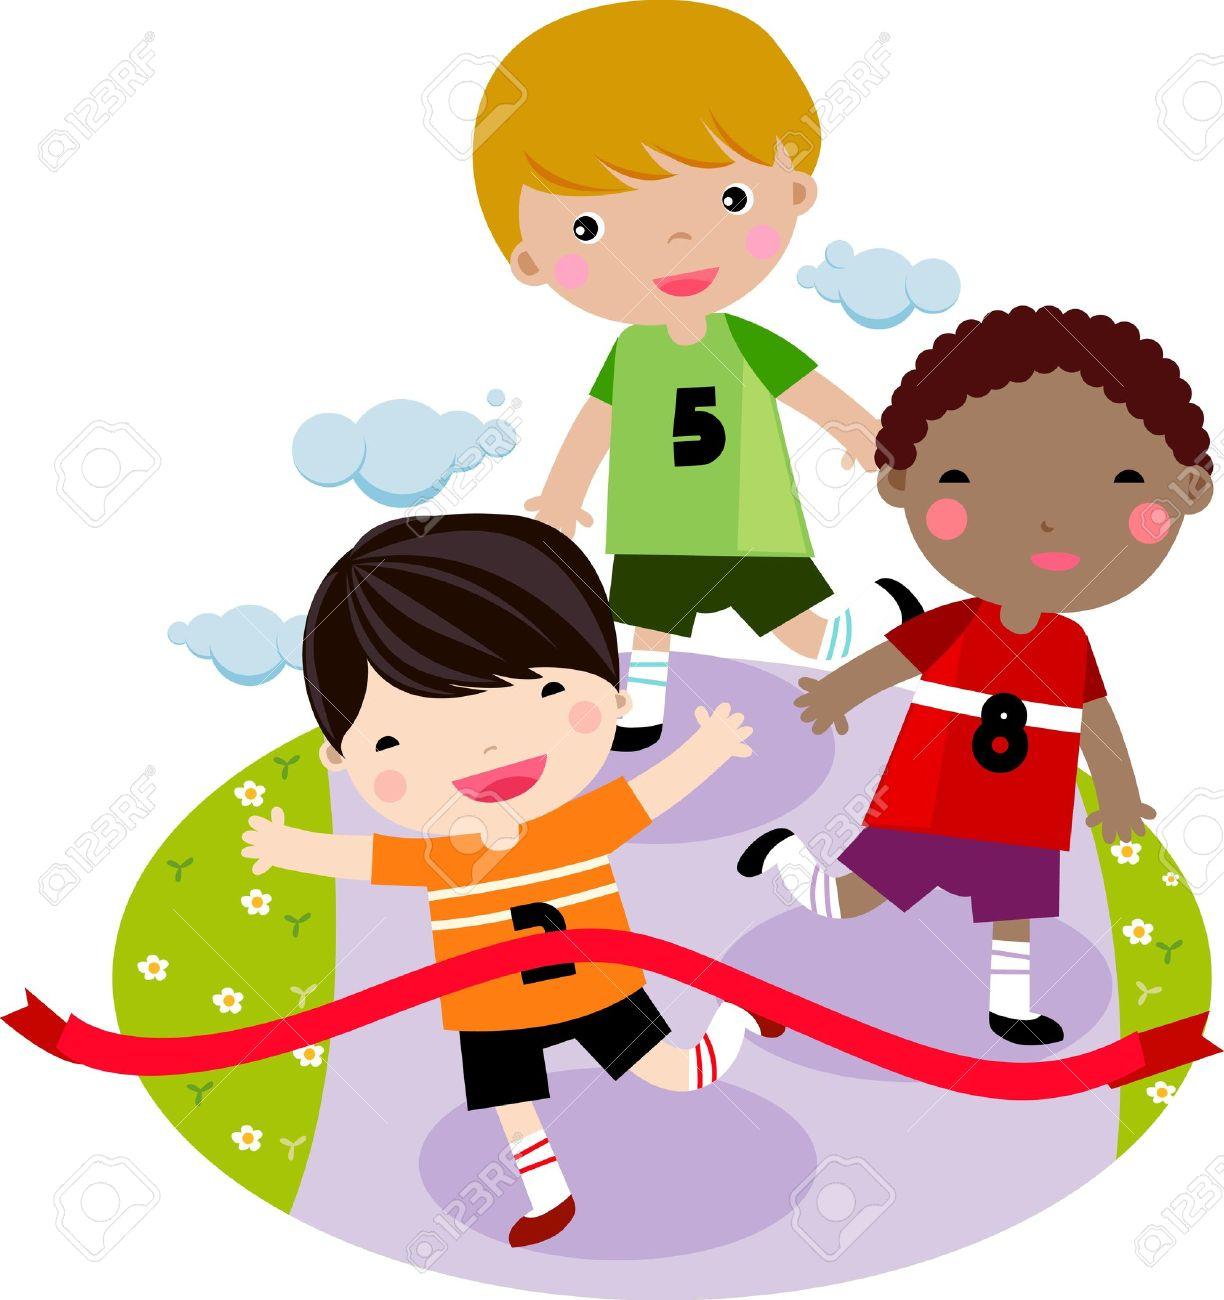 children running royalty free cliparts vectors and stock rh 123rf com child running clipart black and white child running clipart black and white